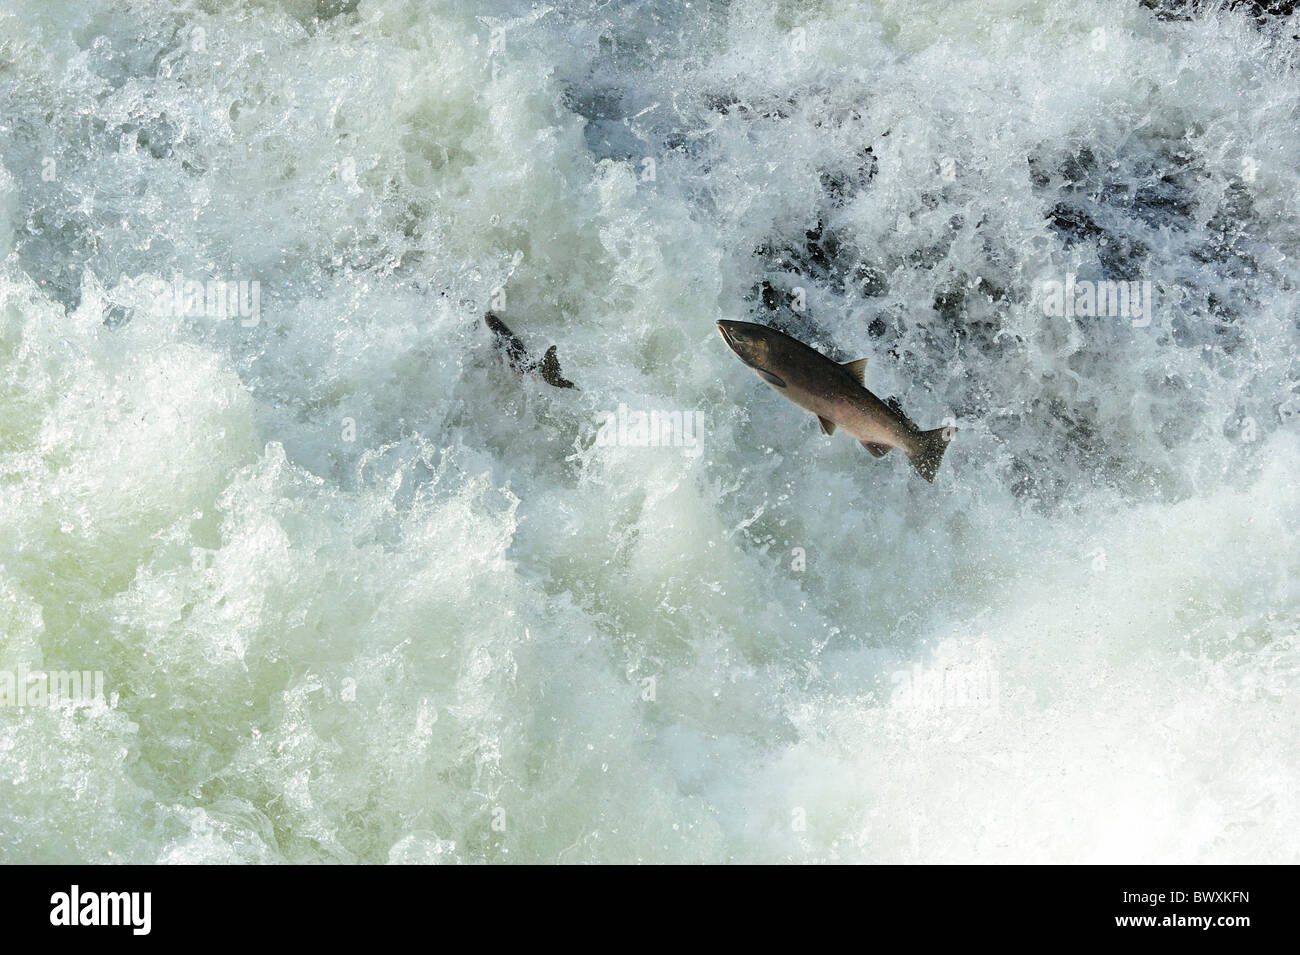 Salmón PLATEADO O COHO, Oncorhynchus kisutch, Río Sol Duc, Olympic National Park, Washington Foto de stock